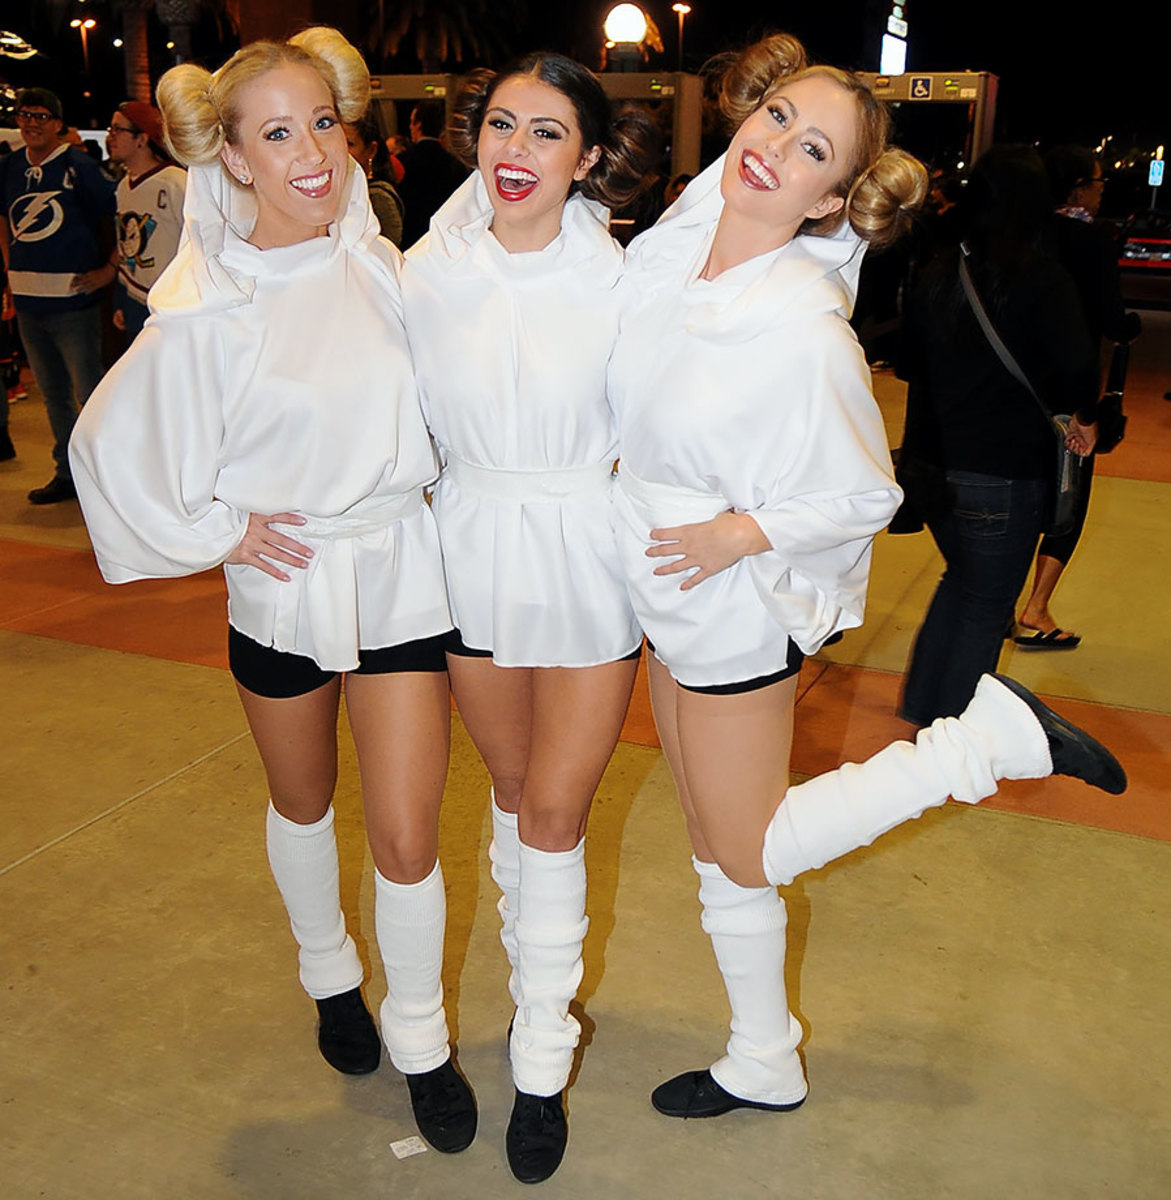 Anaheim-Ducks-Power-Players-Ice-Girls-506151130010_Lightning_at_Ducks.jpg